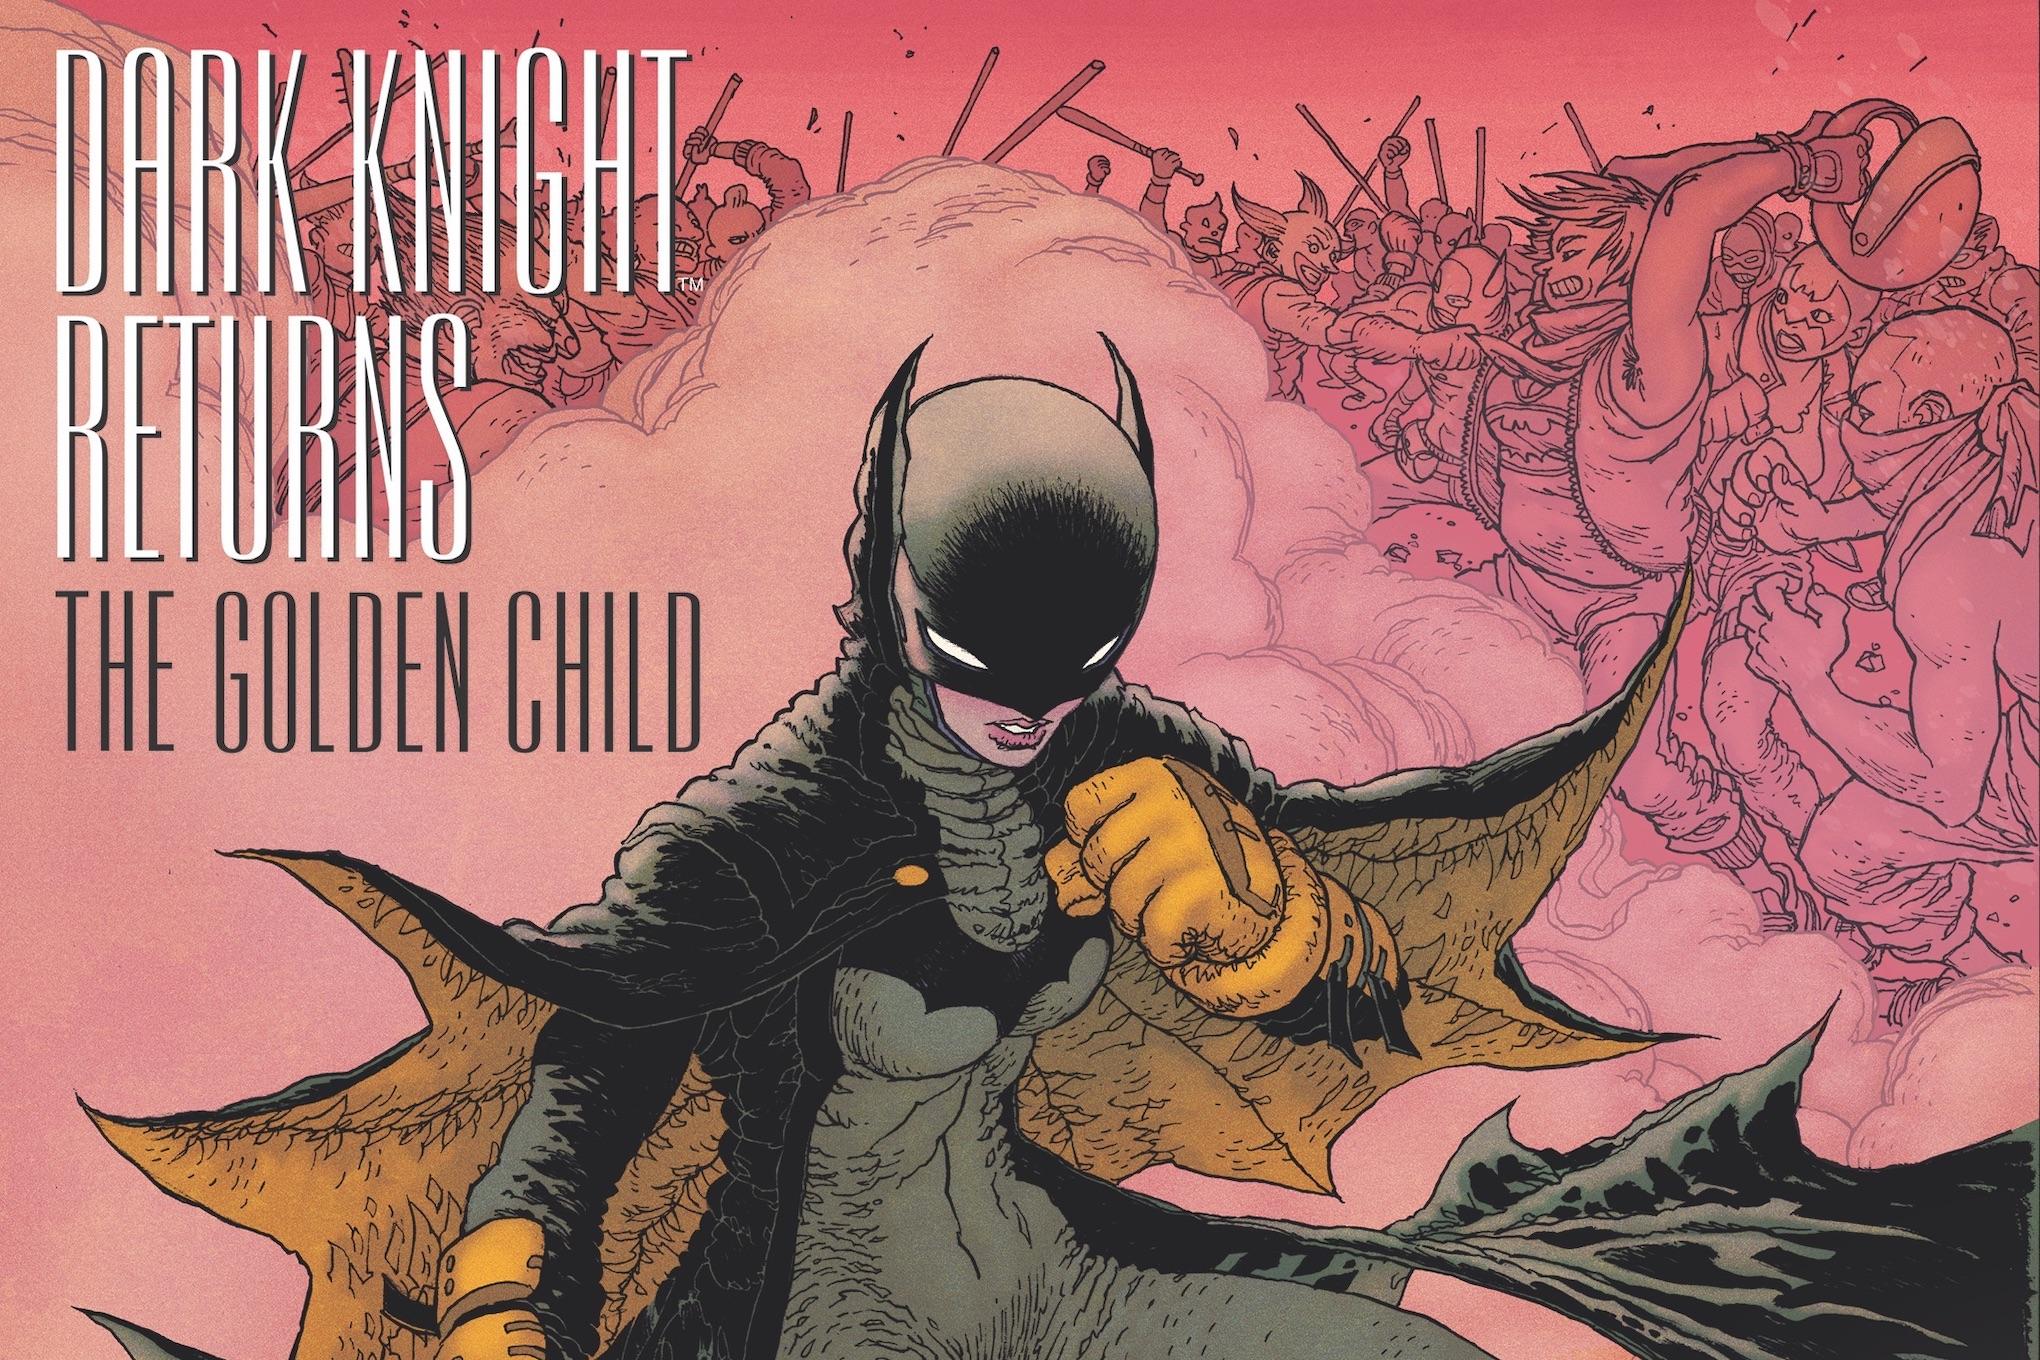 Frank Miller returns to the Dark Knight yet again, in The Golden Child